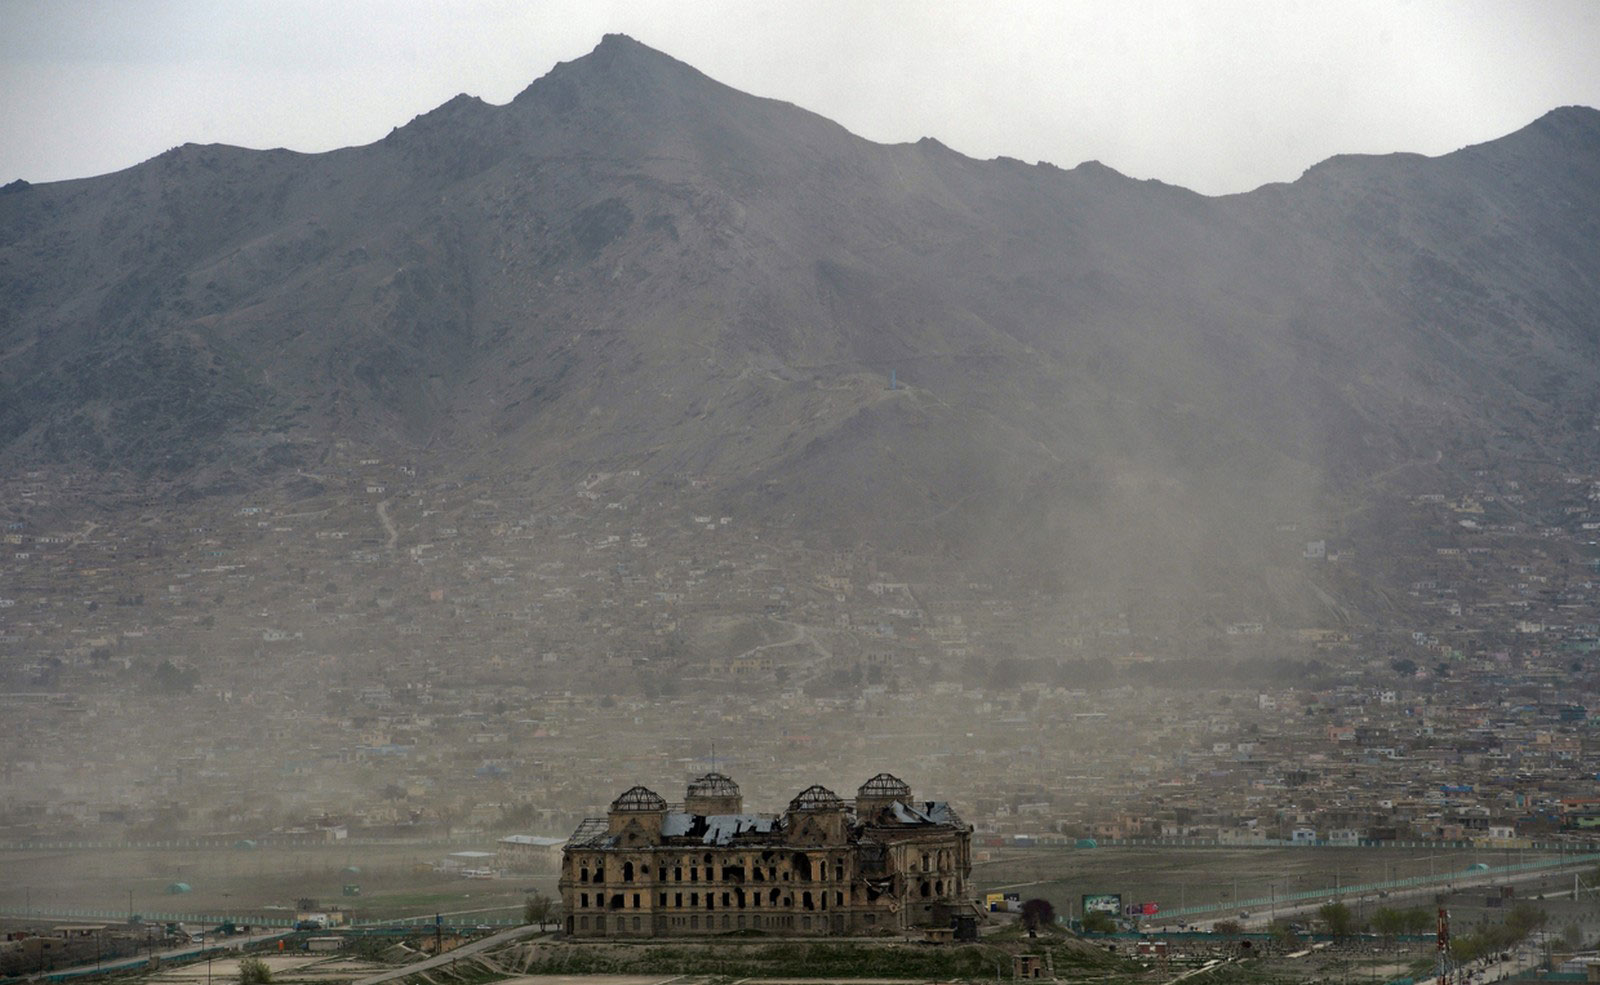 разрушенный дворец Дар уль Аман в Кабуле